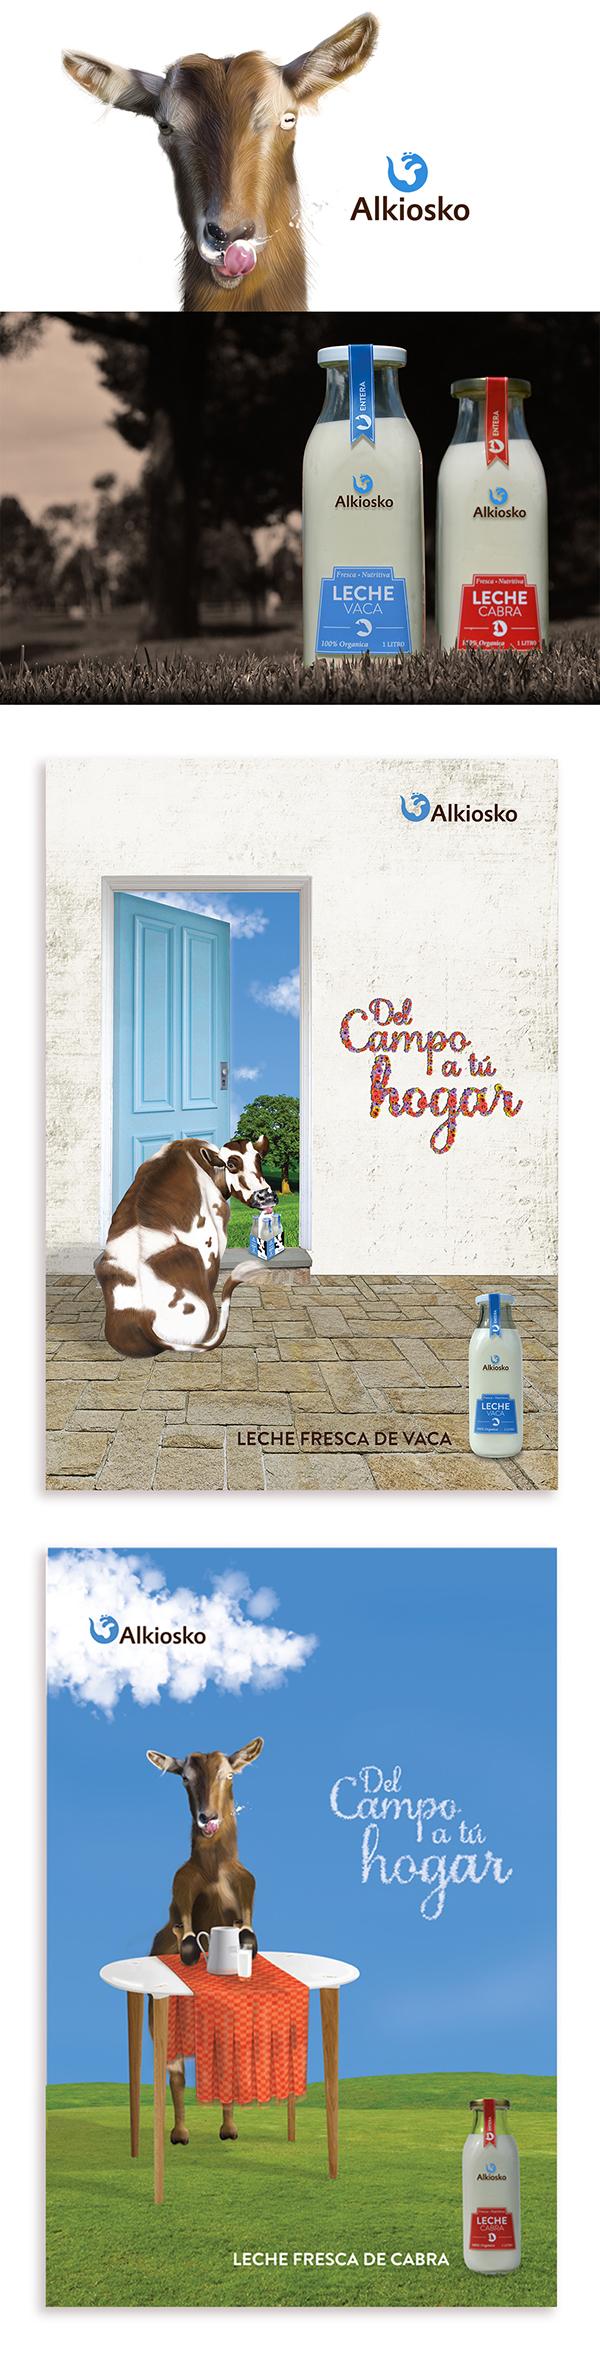 leche cabra Vaca milk goat